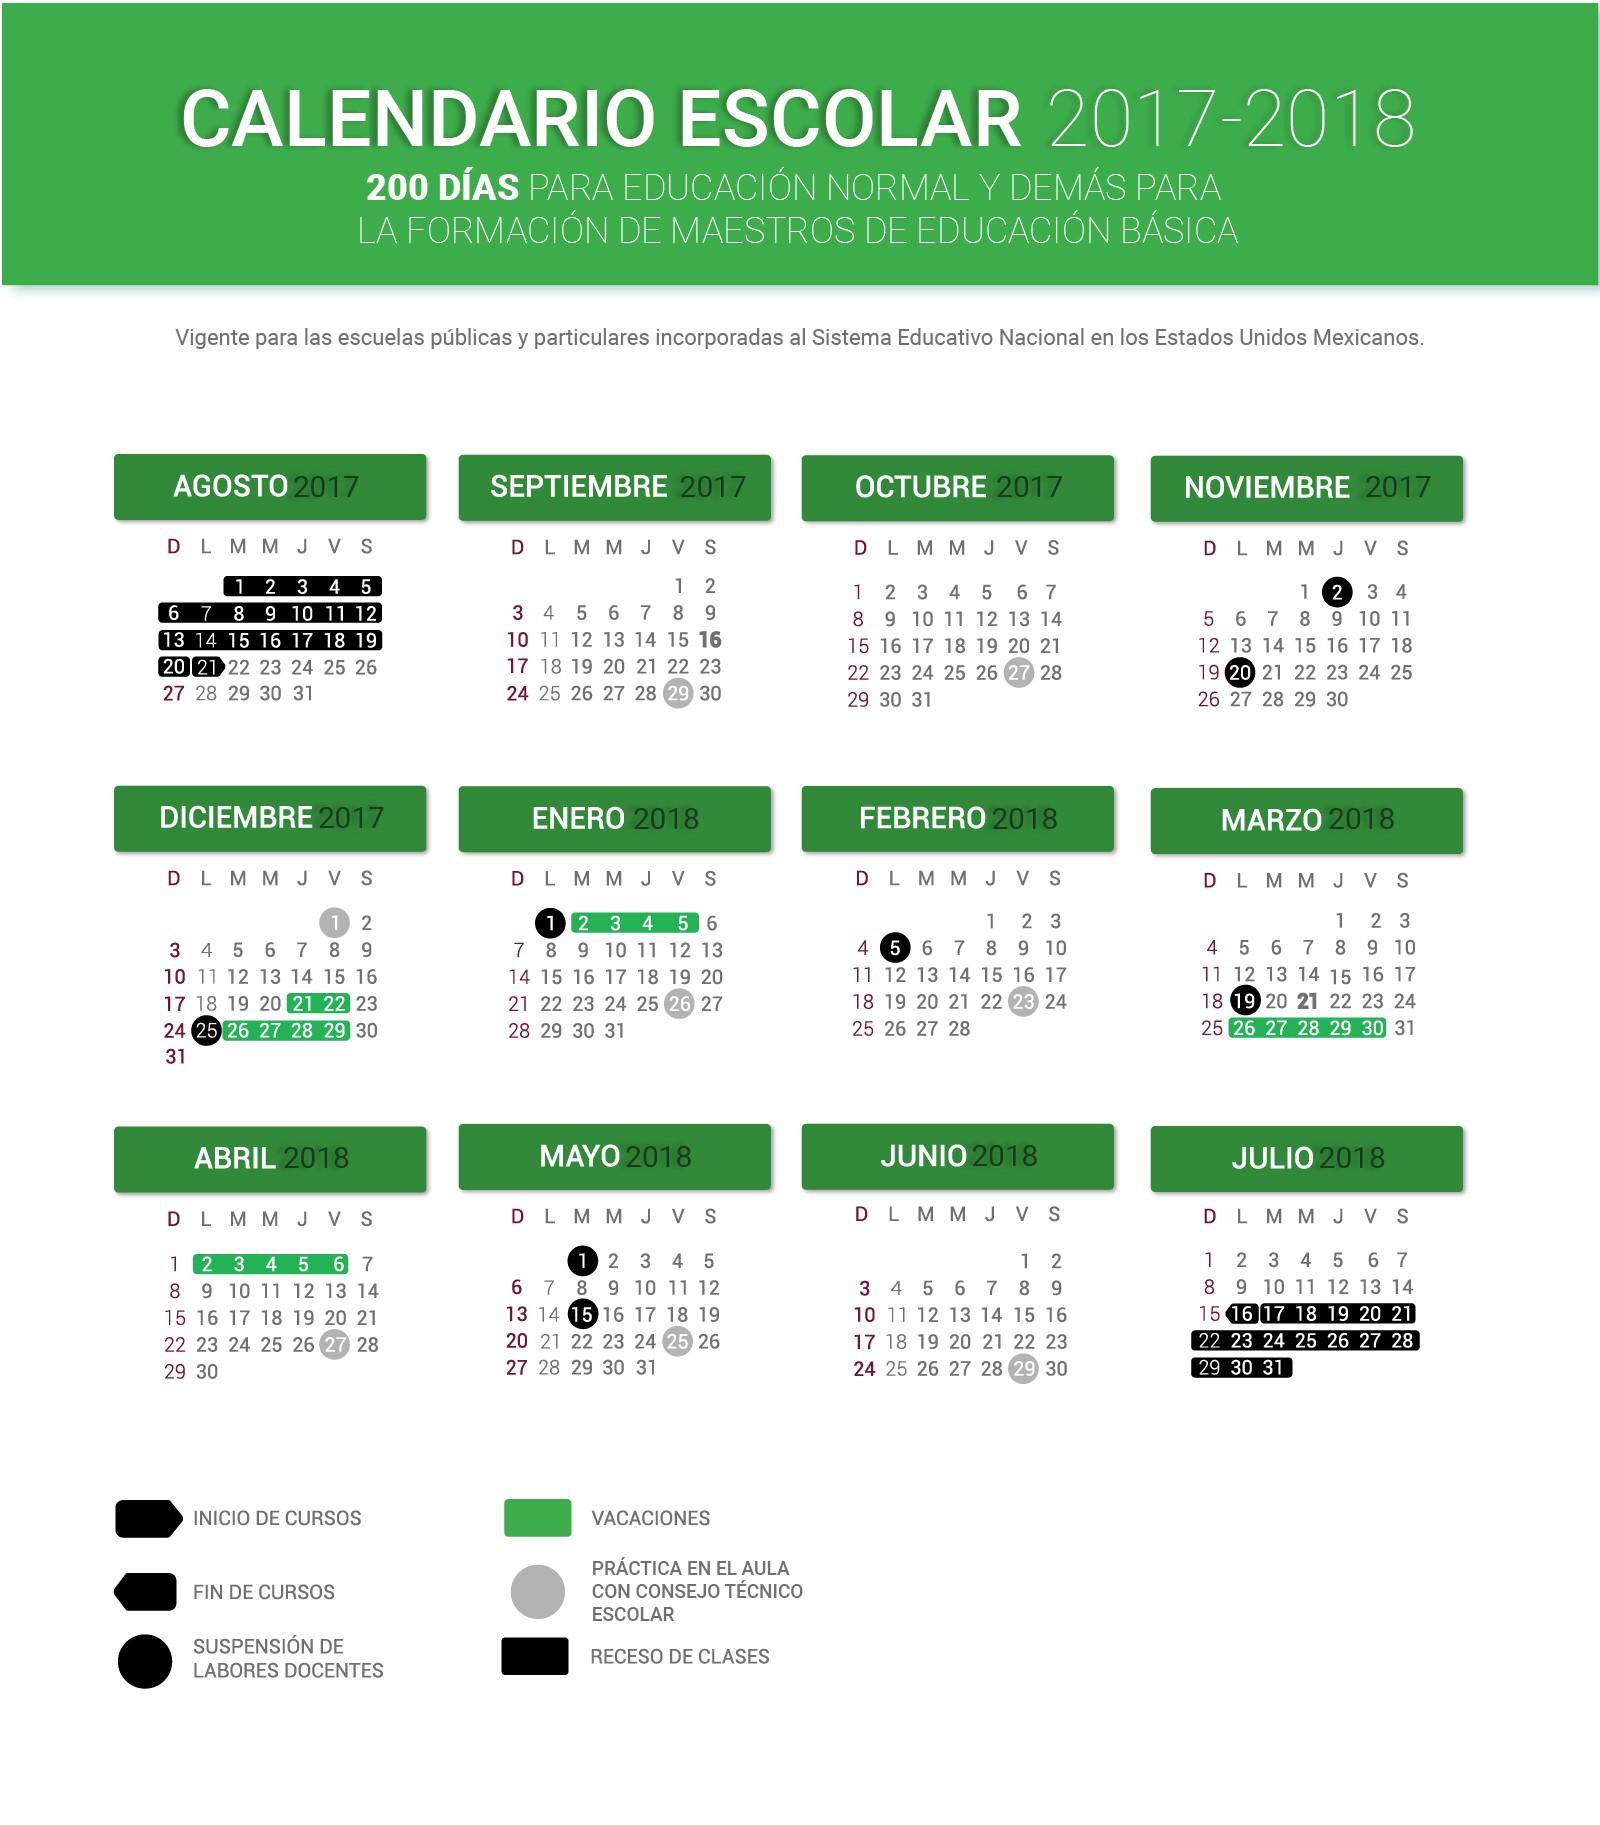 Calendario Para Imprimir 2019 Janeiro Más Recientemente Liberado Root Of Calendario Para Imprimir 2019 Janeiro Actual 2019 2018 Calendar Printable with Holidays List Kalender Kalendar